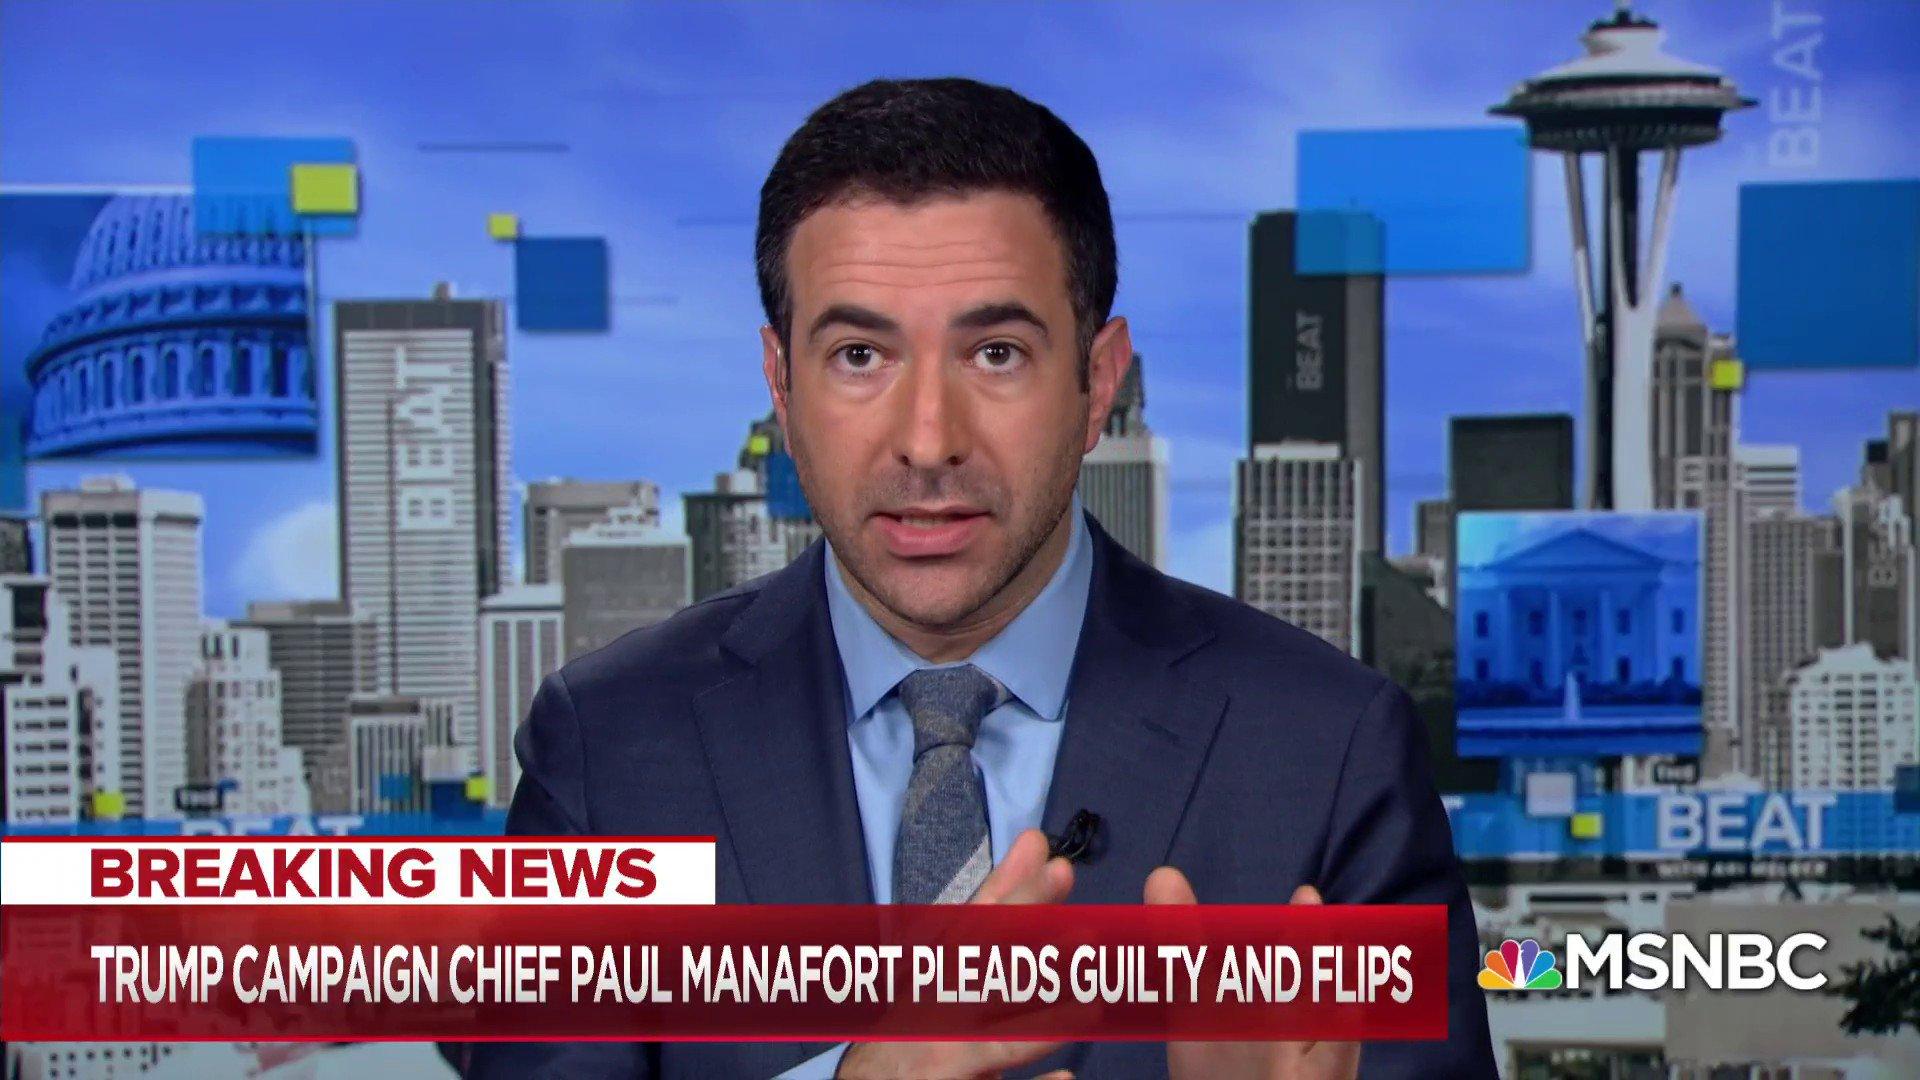 Paul Manafort pleads guilty and flips https://t.co/AZuJR4uSa1 https://t.co/qhDGnaS2do